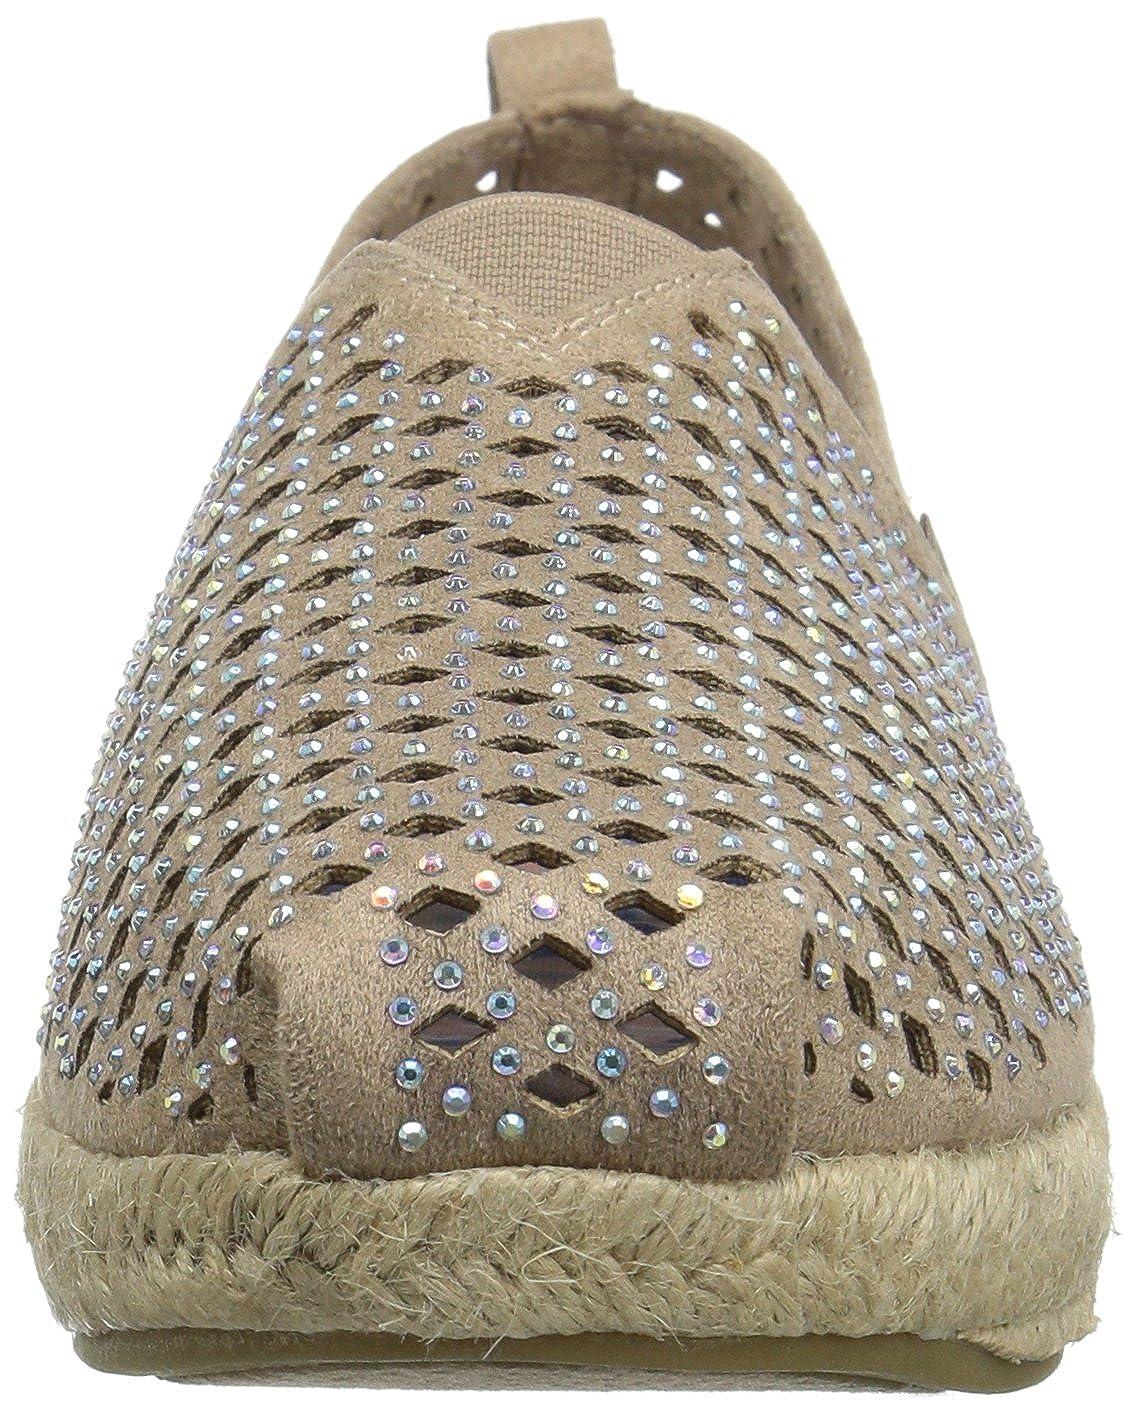 Skechers Damen Highlights-Amaze Schuh Taupe Gem